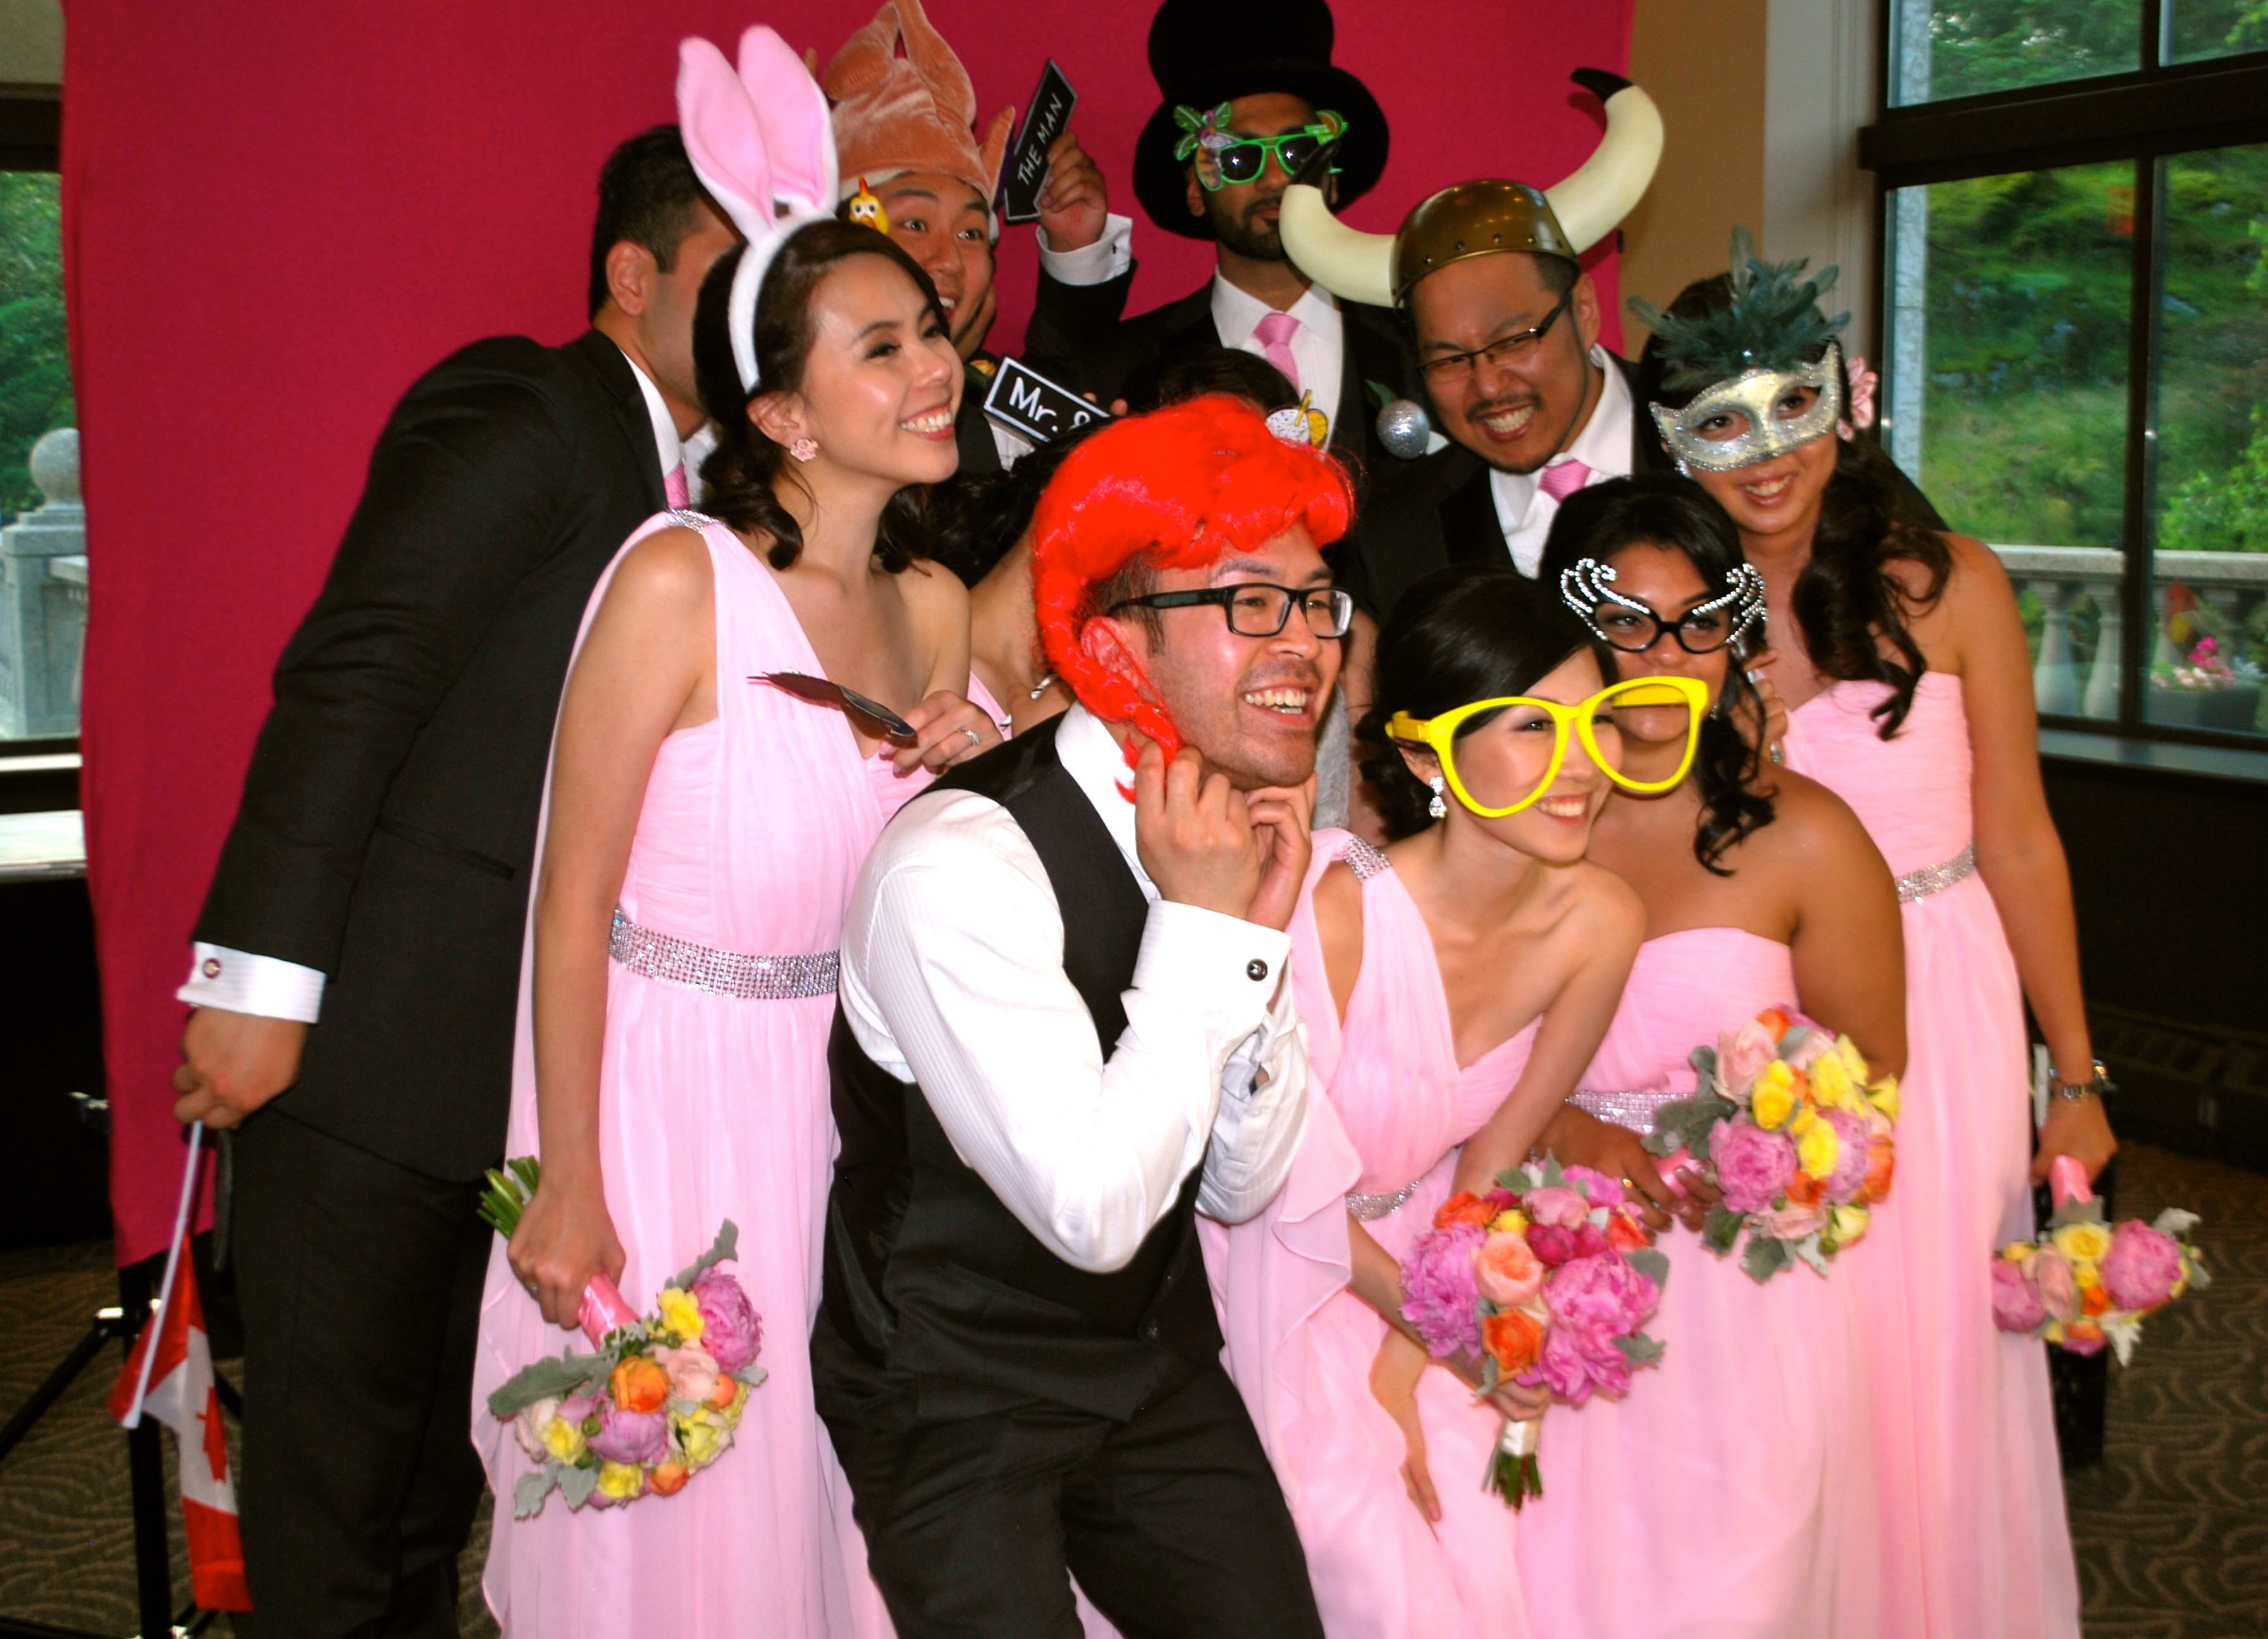 Fabulous Have a look at this Wedding Riviera Maya Photo Booth VM43